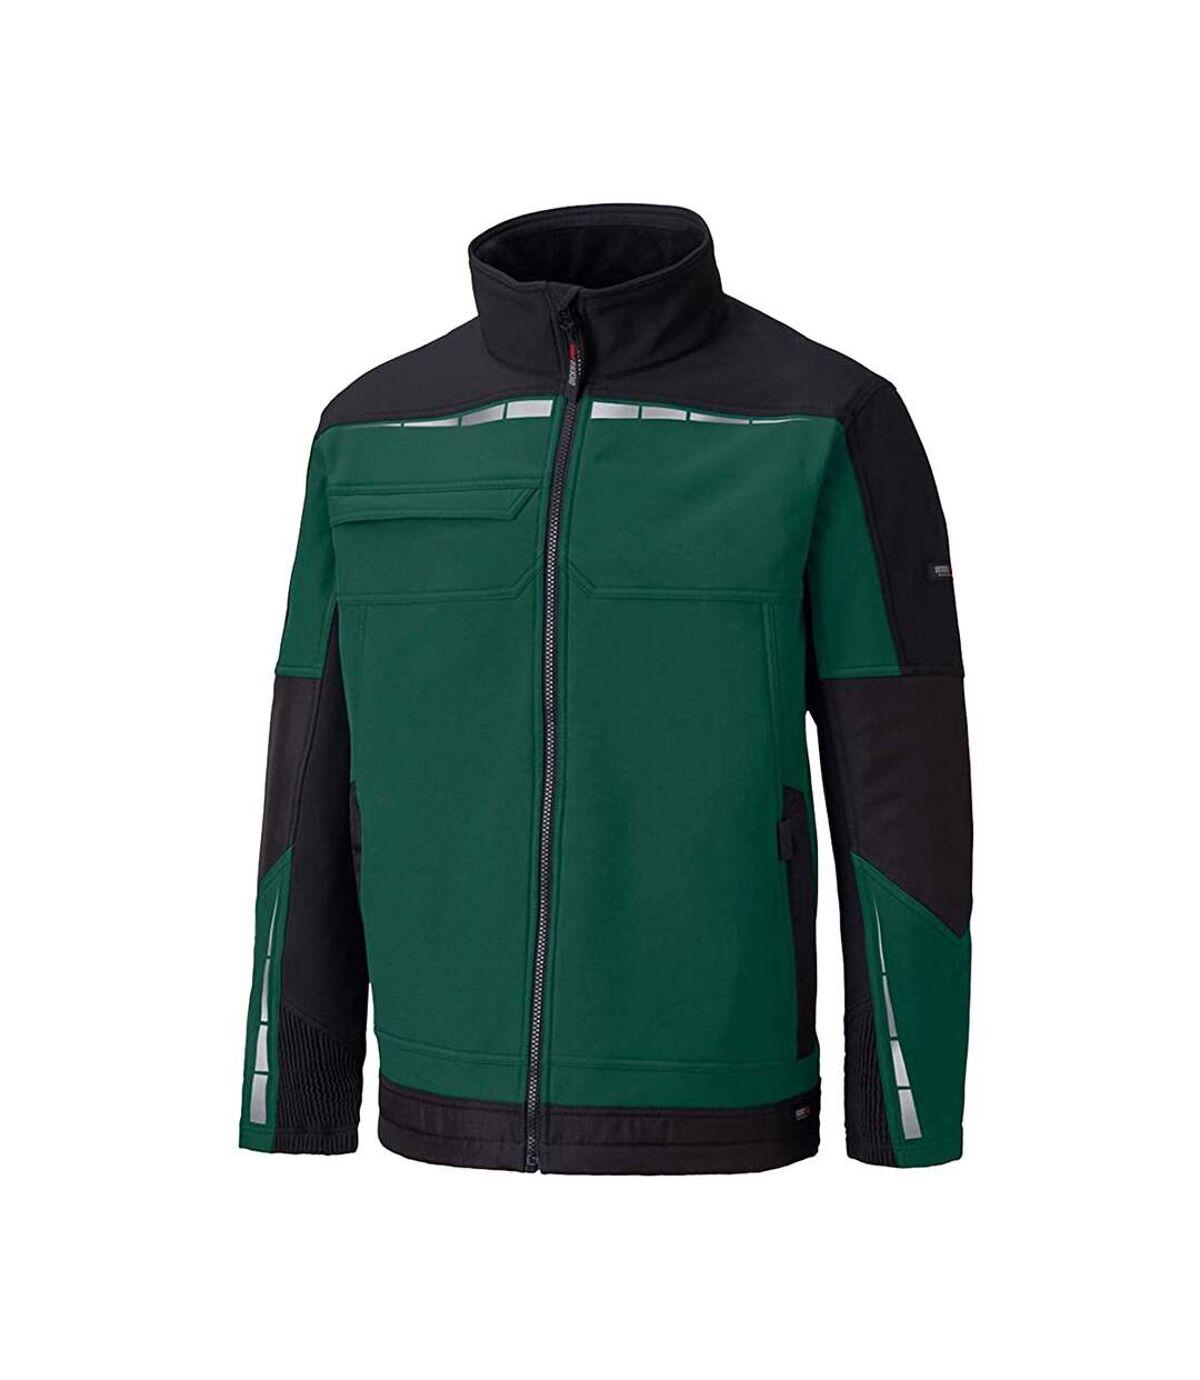 Dickies Mens Pro Jacket (Green/Black) - UTRW6207